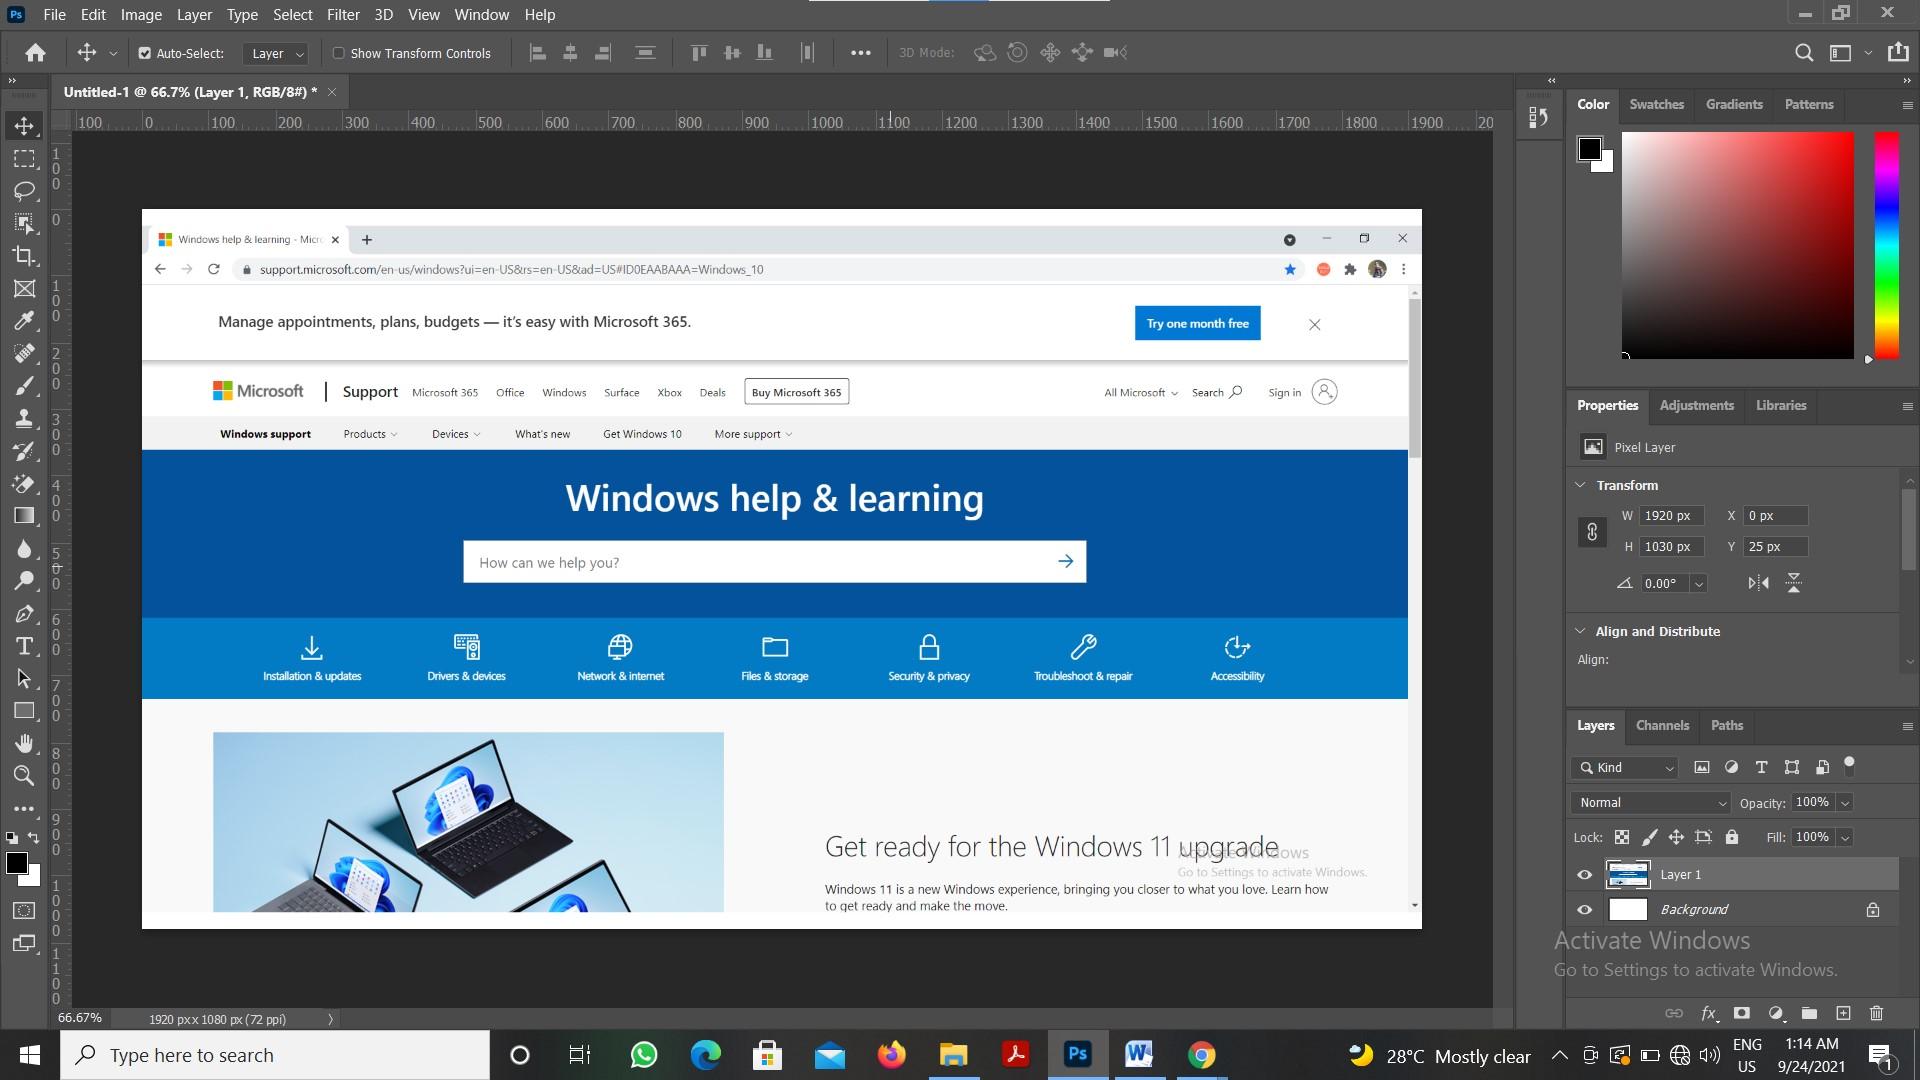 screenshots in windows 10 alt print screen